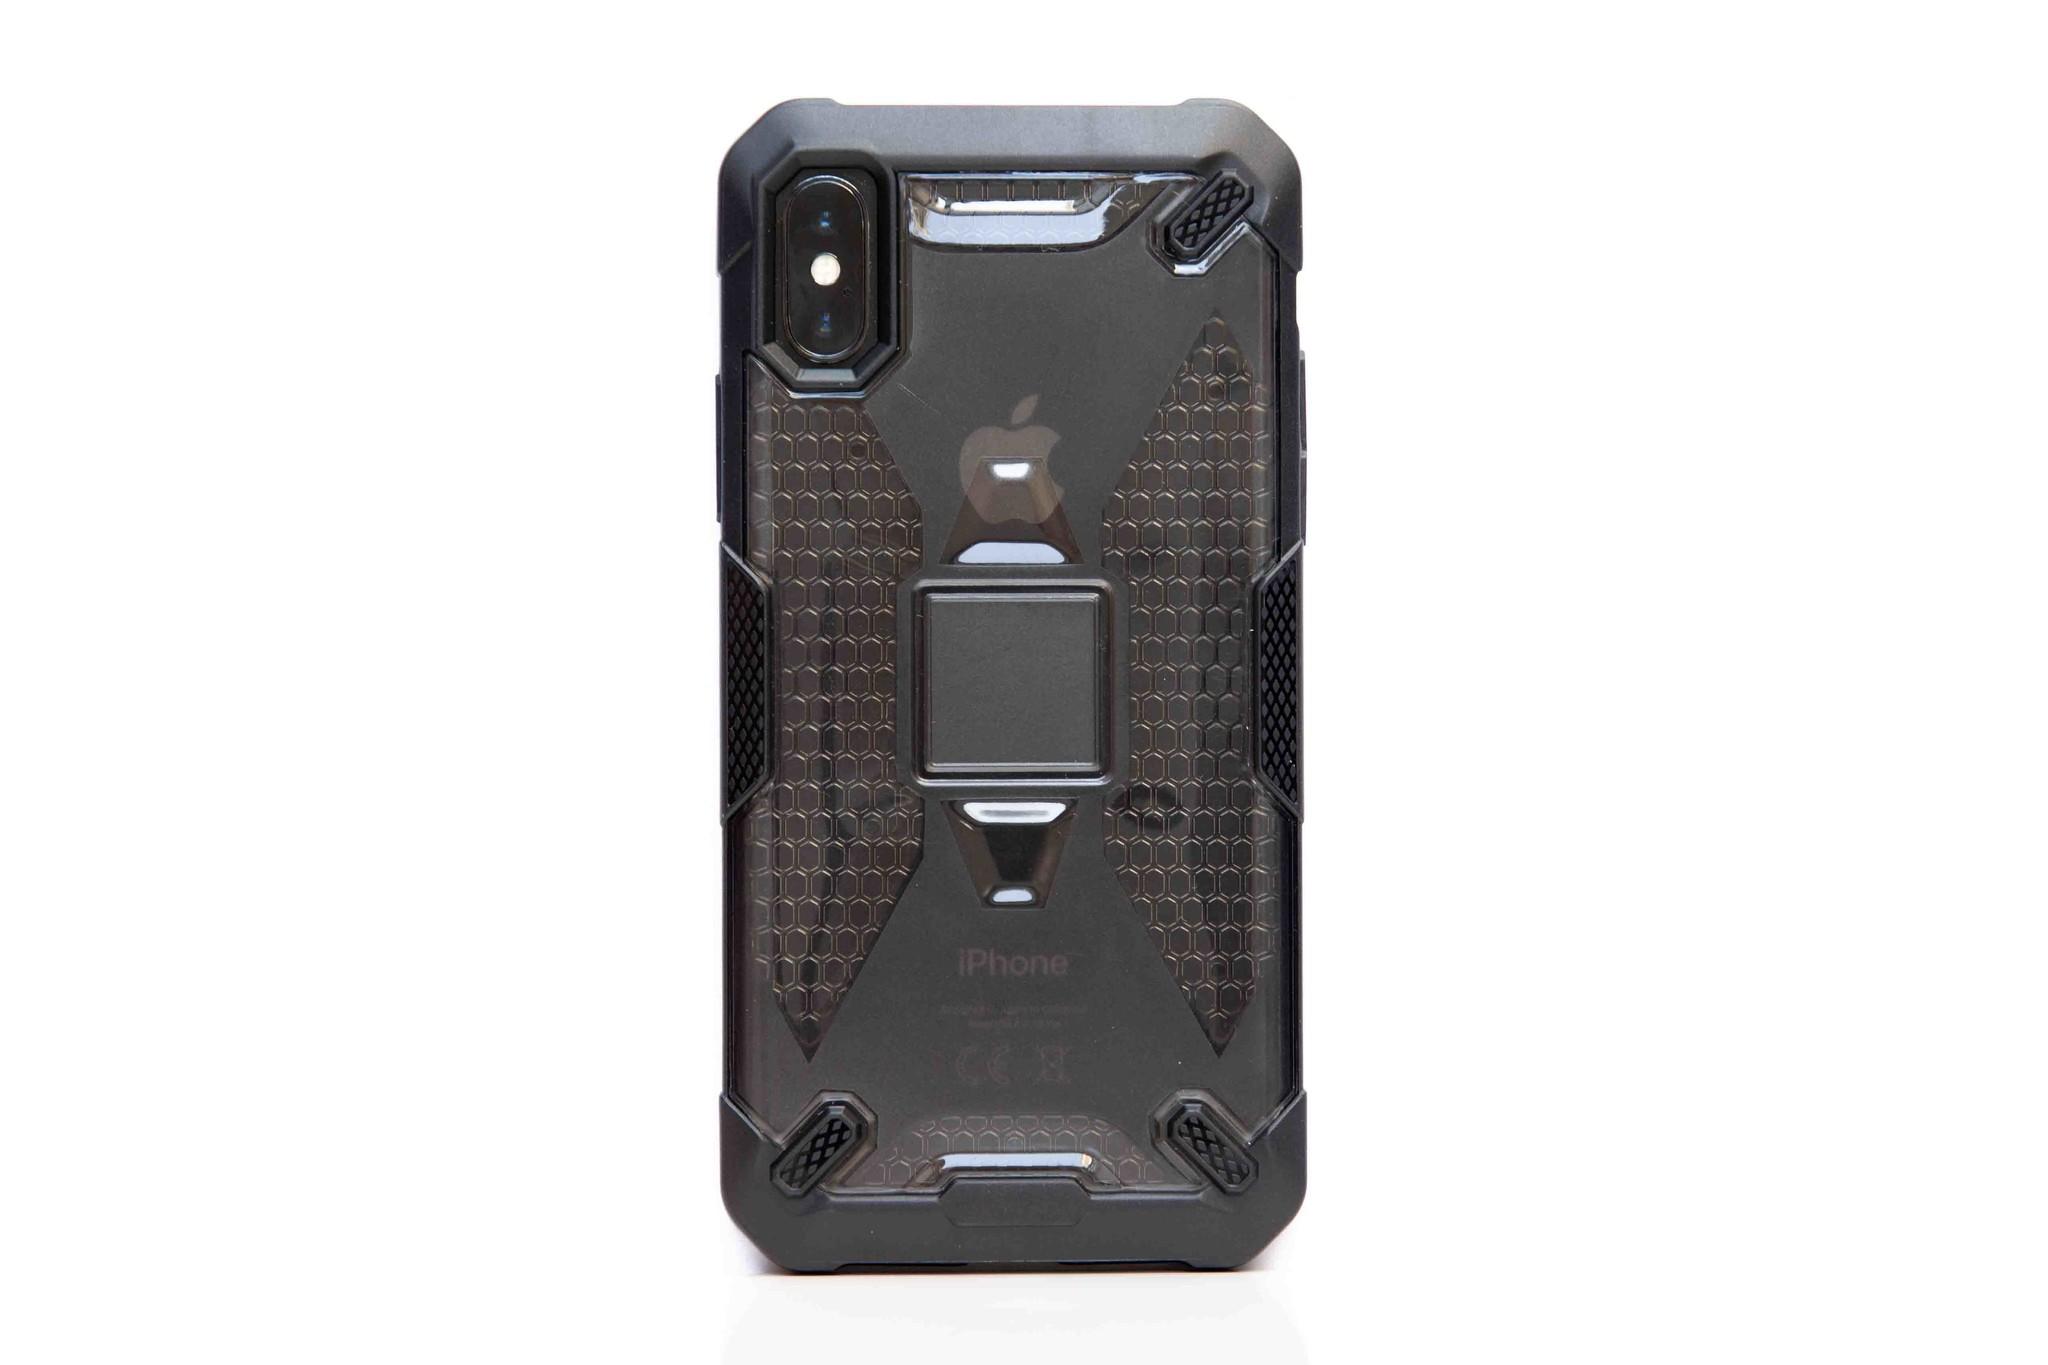 Smartphonehoesje iPhone 7 plus / 8 plus | Shockproof met standaard